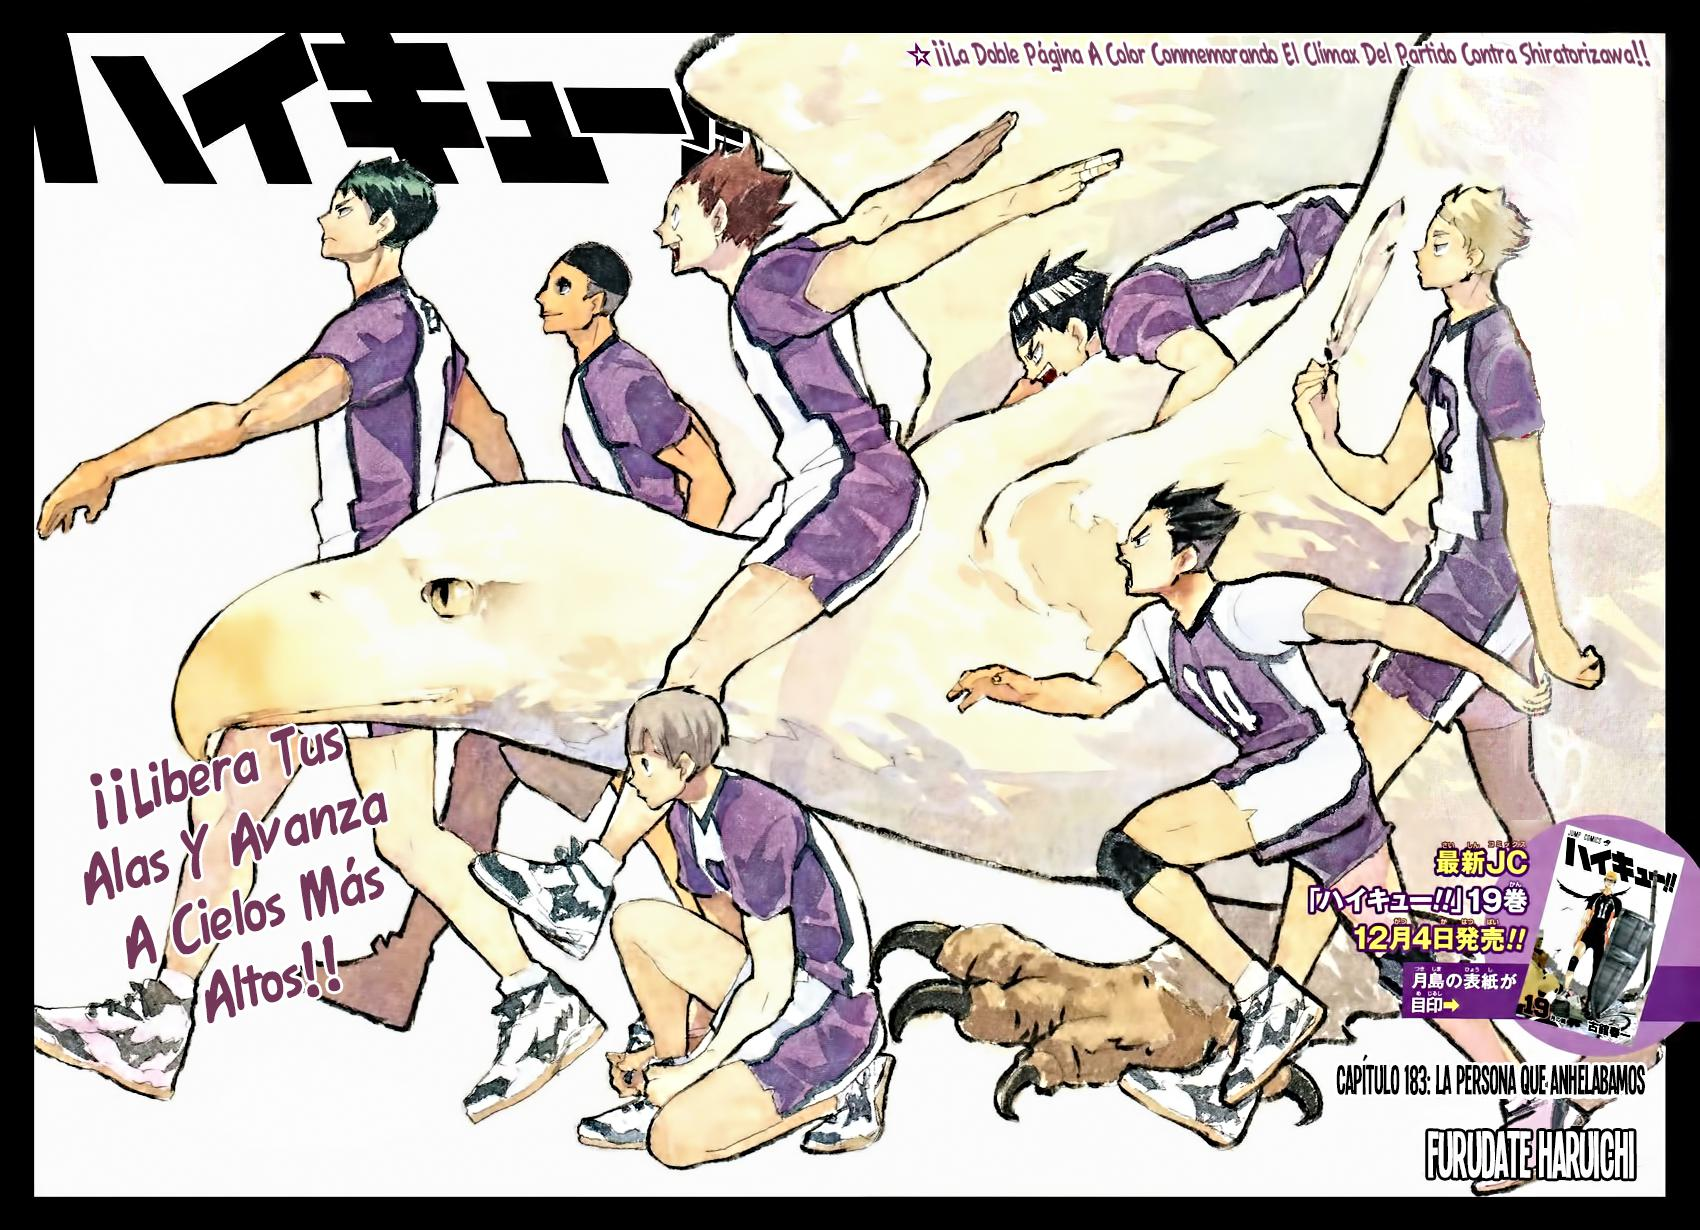 http://c5.ninemanga.com/es_manga/10/10/431140/a125b9c3f3438fb8c1e8dd0c11148d8f.jpg Page 4